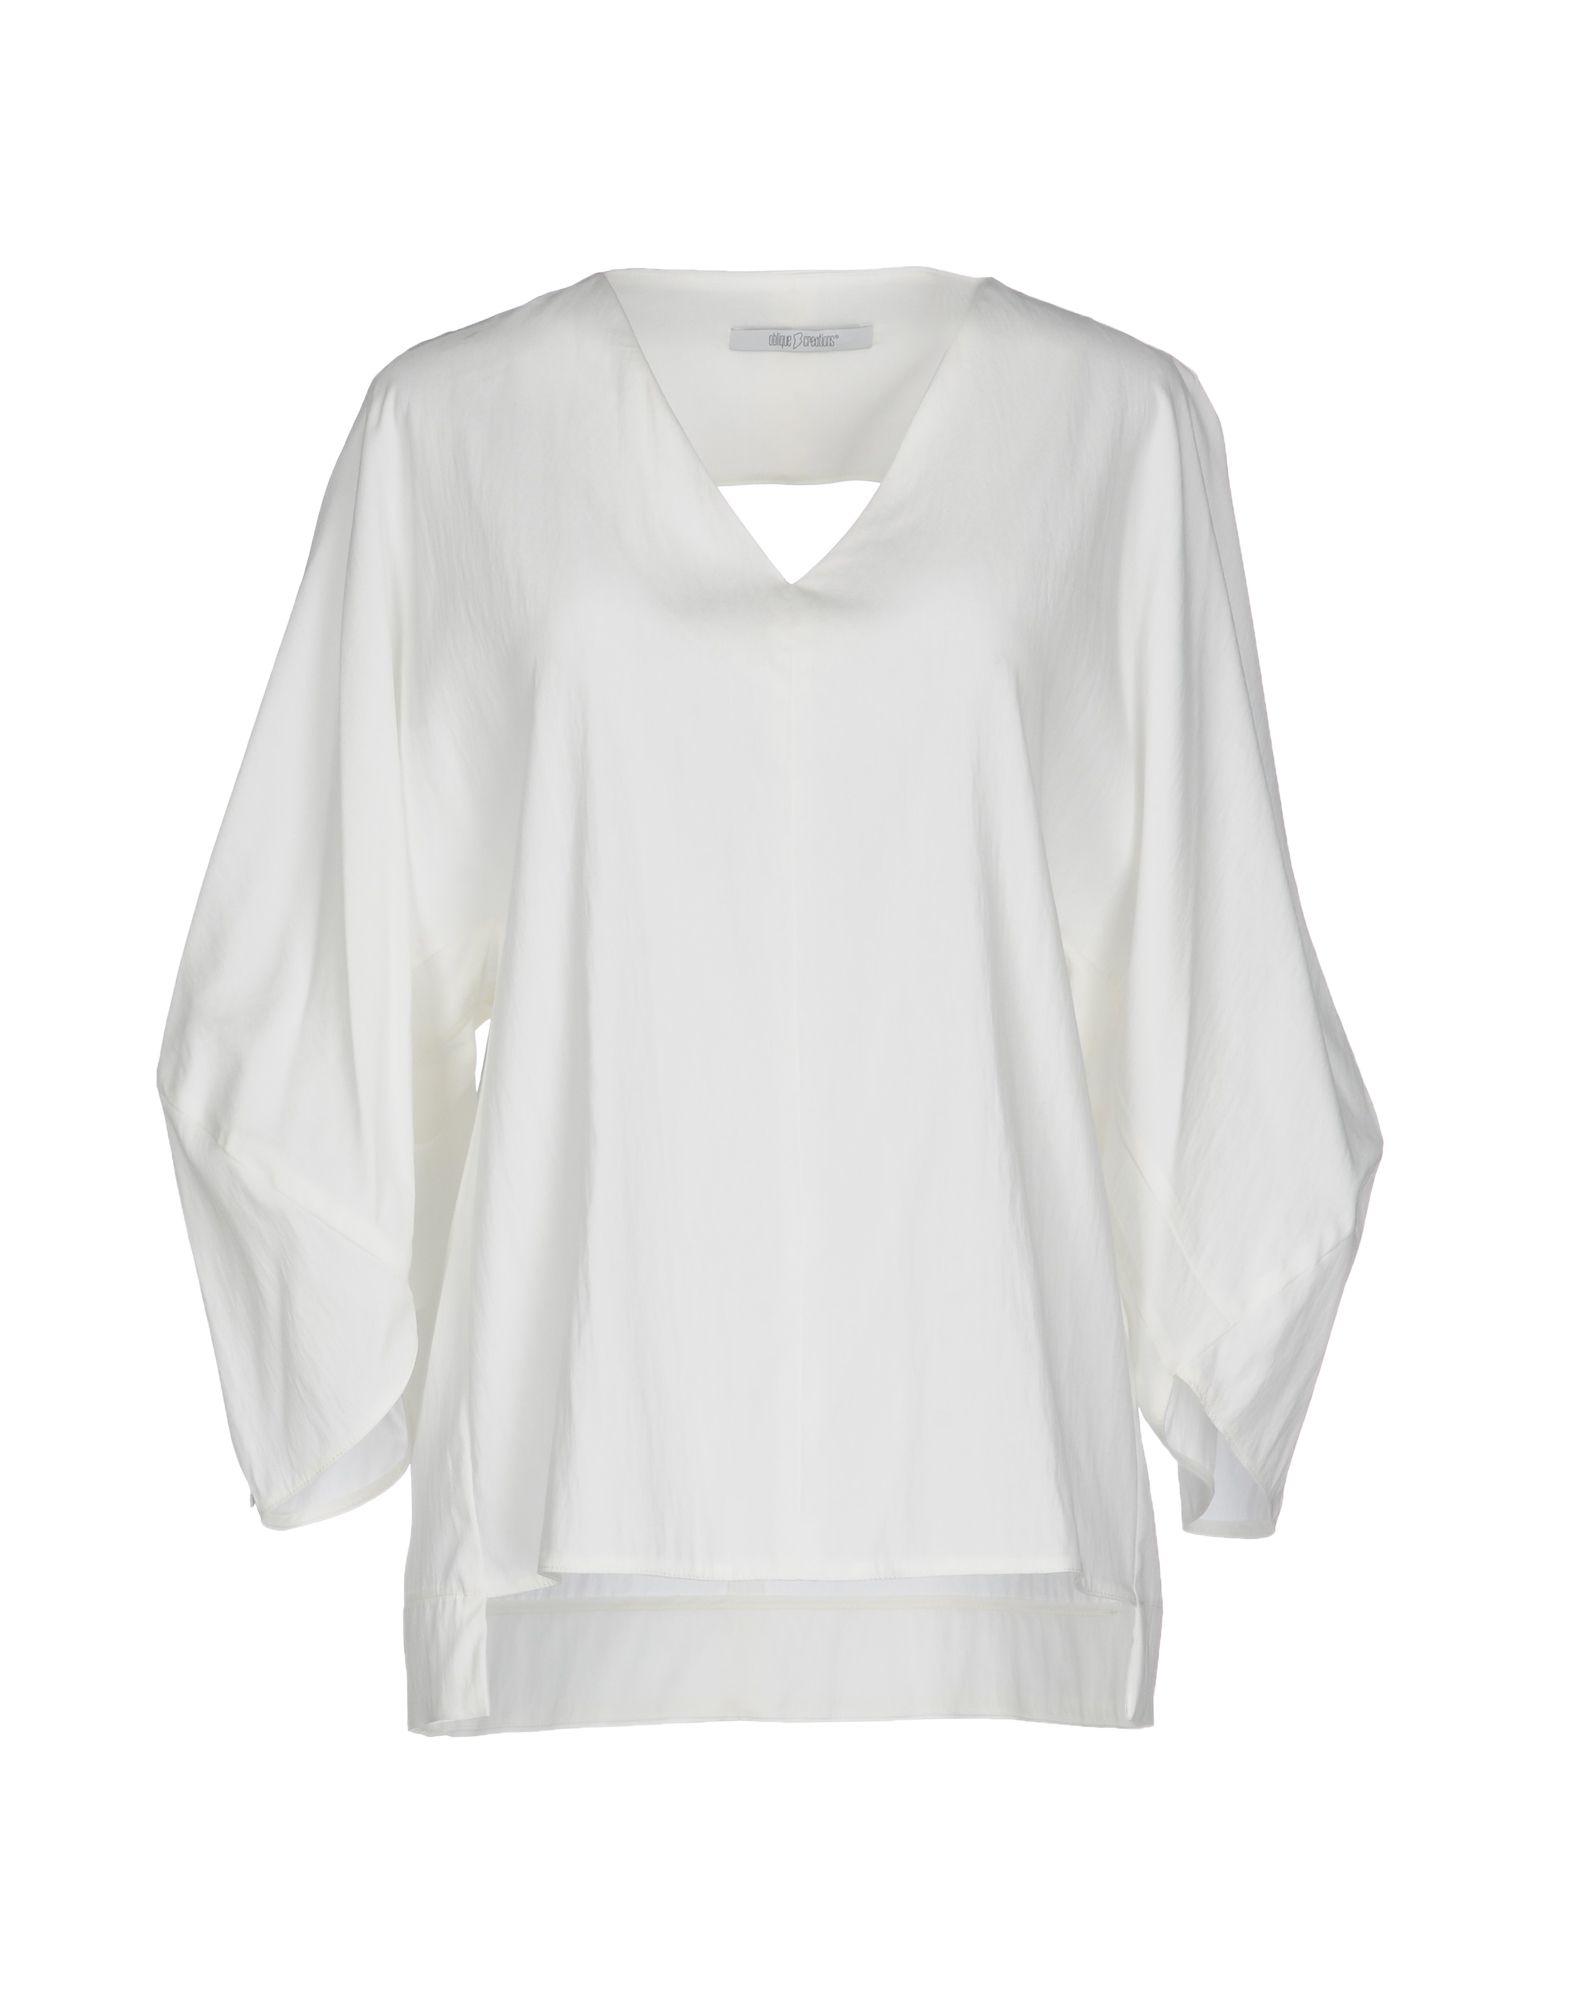 OBLIQUE CREATIONS Блузка клепки для одежды three creations 1000 10 nailheads 80374